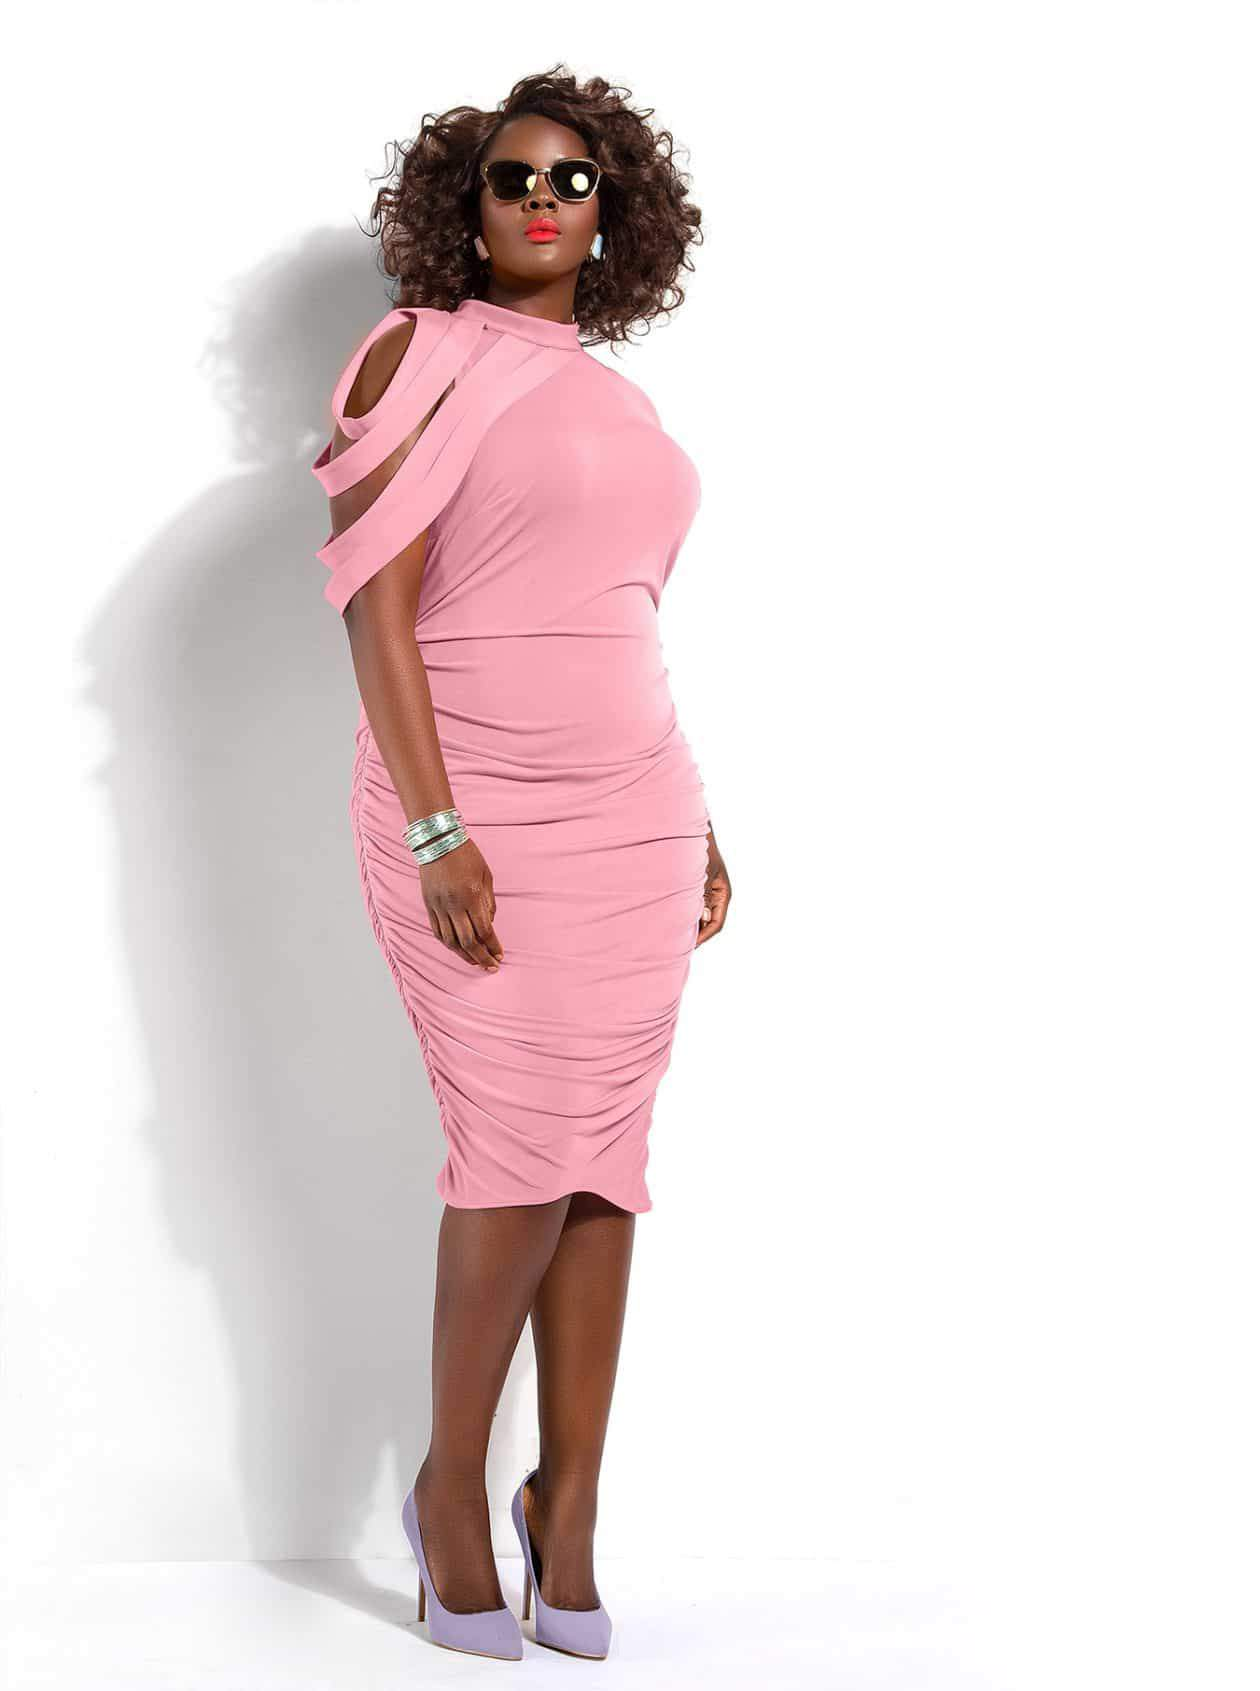 10 Plus Size Wedding Guest Dress Ideas on TheCurvyFashionista.com #TCFStyle